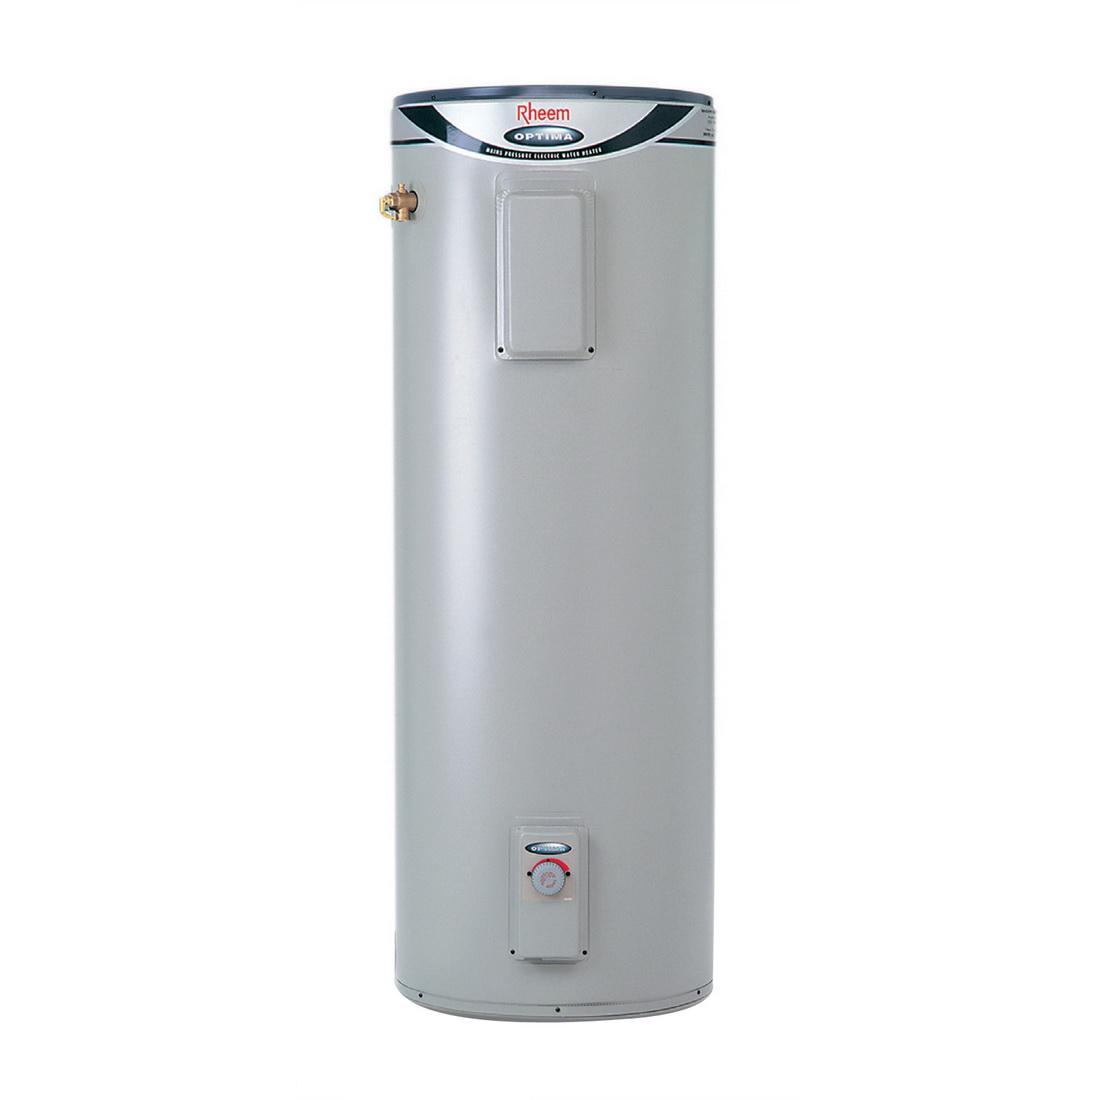 Rheem Optima Mains Pressure Electric Hot Water Cylinder 293L 580 x 1825mm 2 x 3kW 91330025